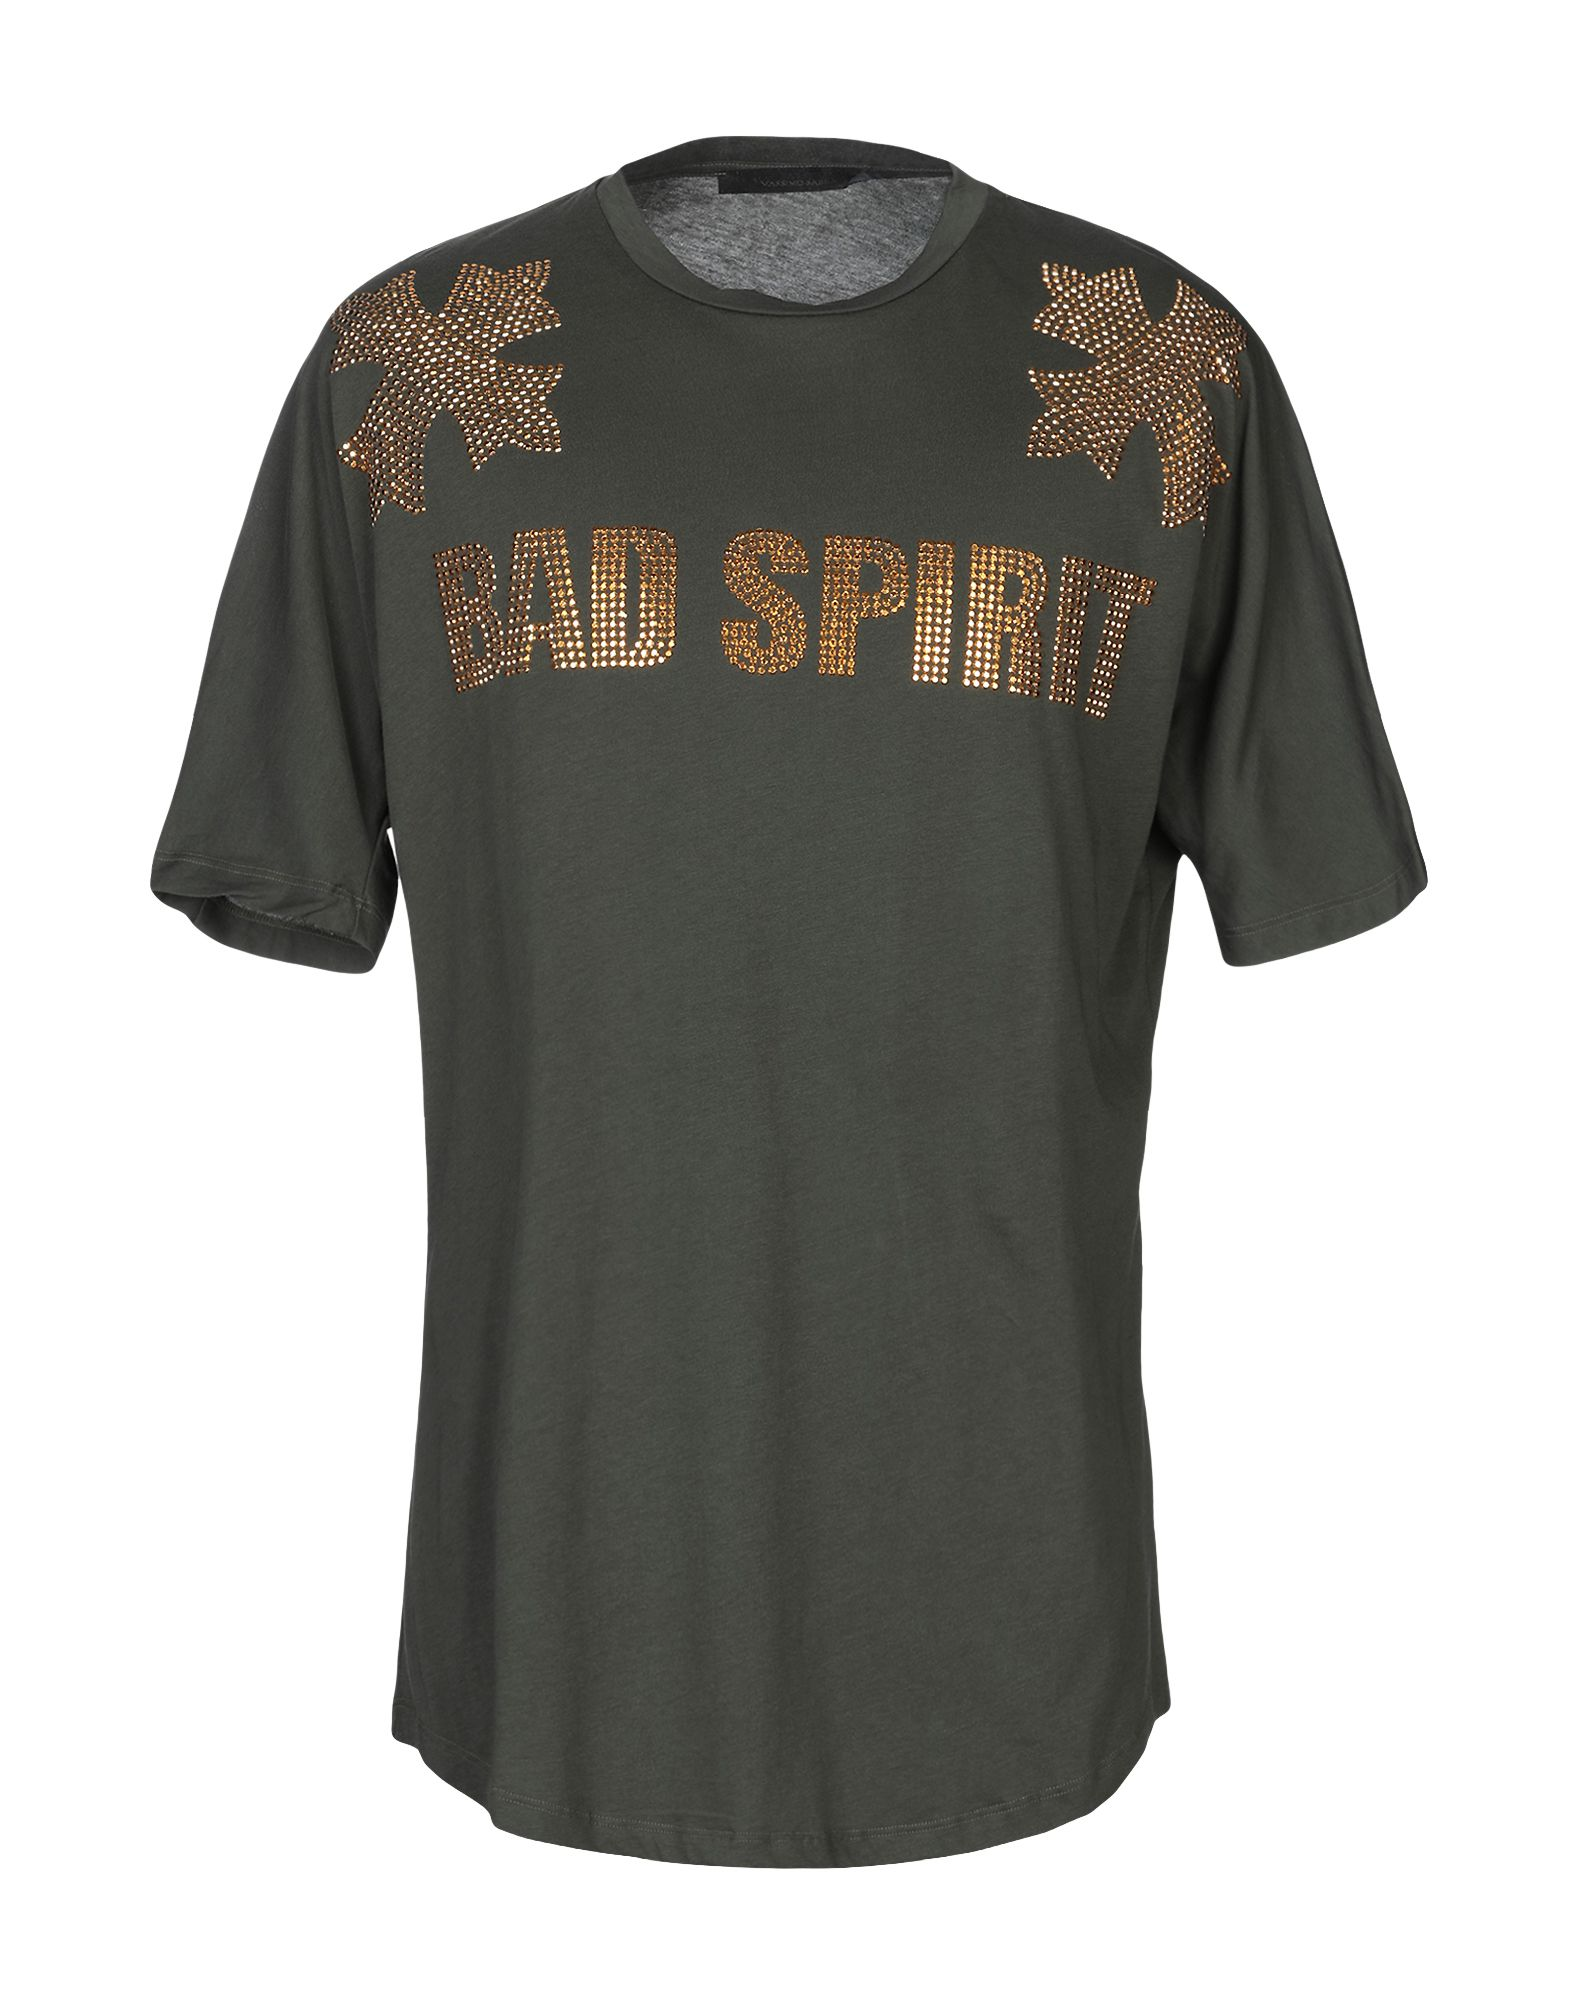 BAD SPIRIT Футболка new balance x bad spirit футболка